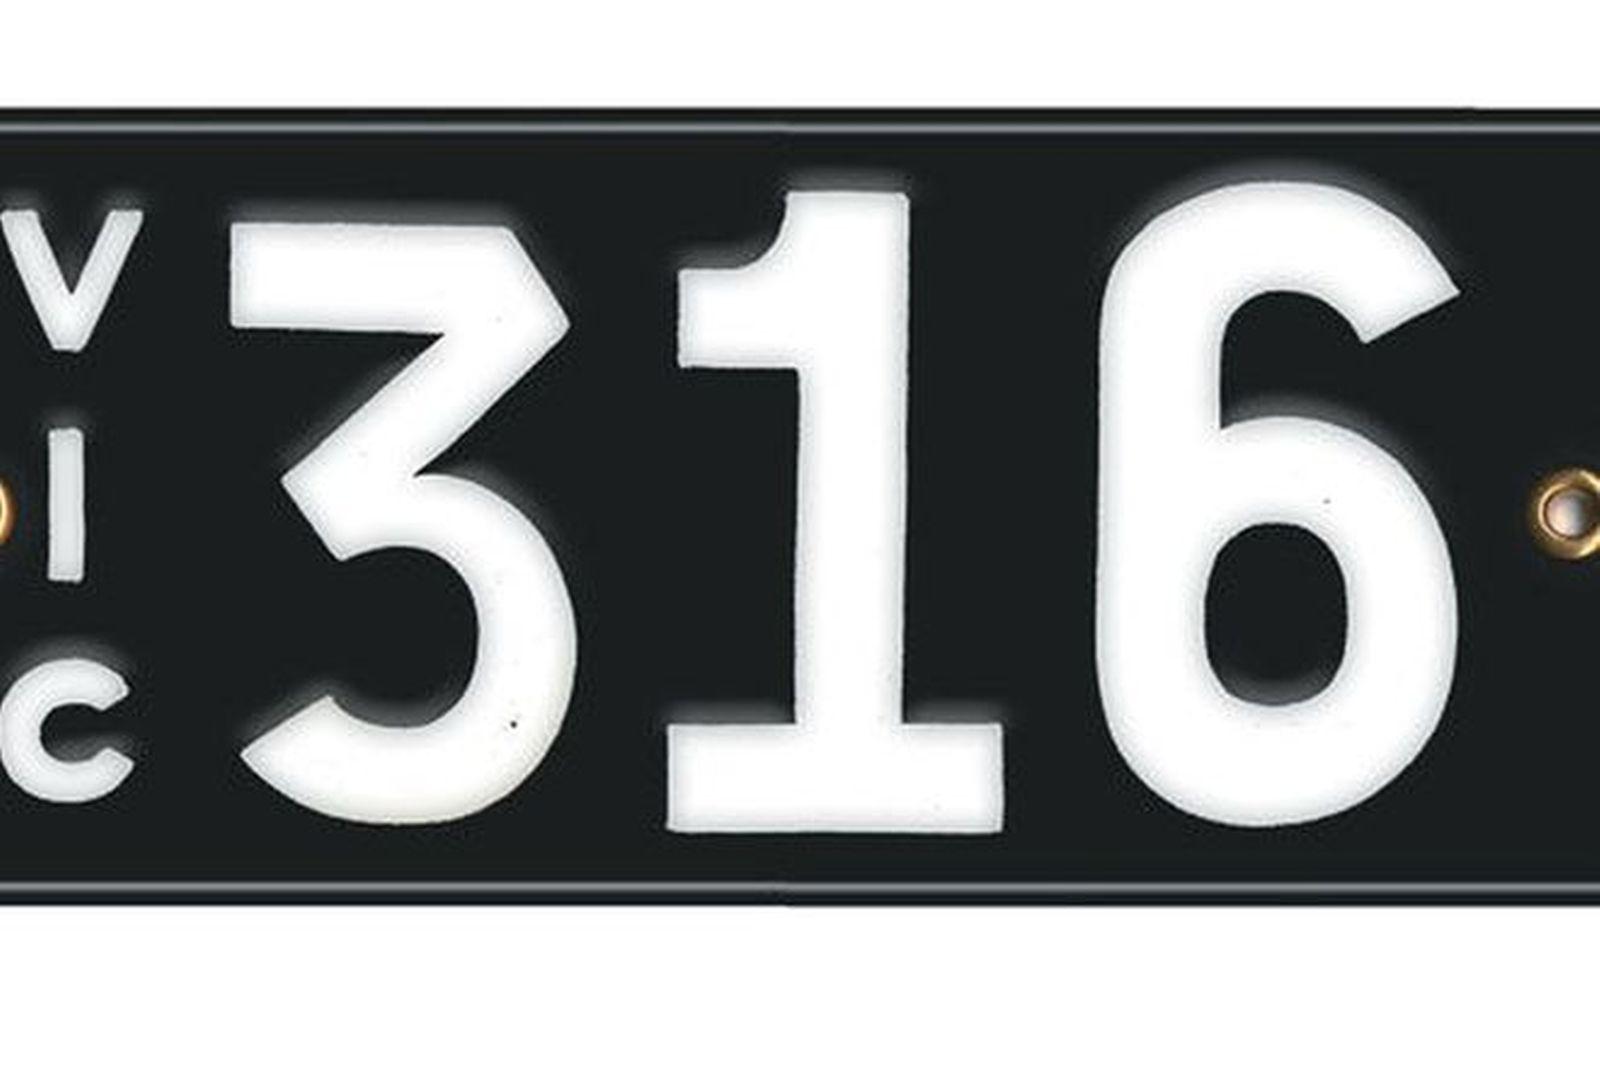 Victorian Vitreous Enamel Number Plates - '316'